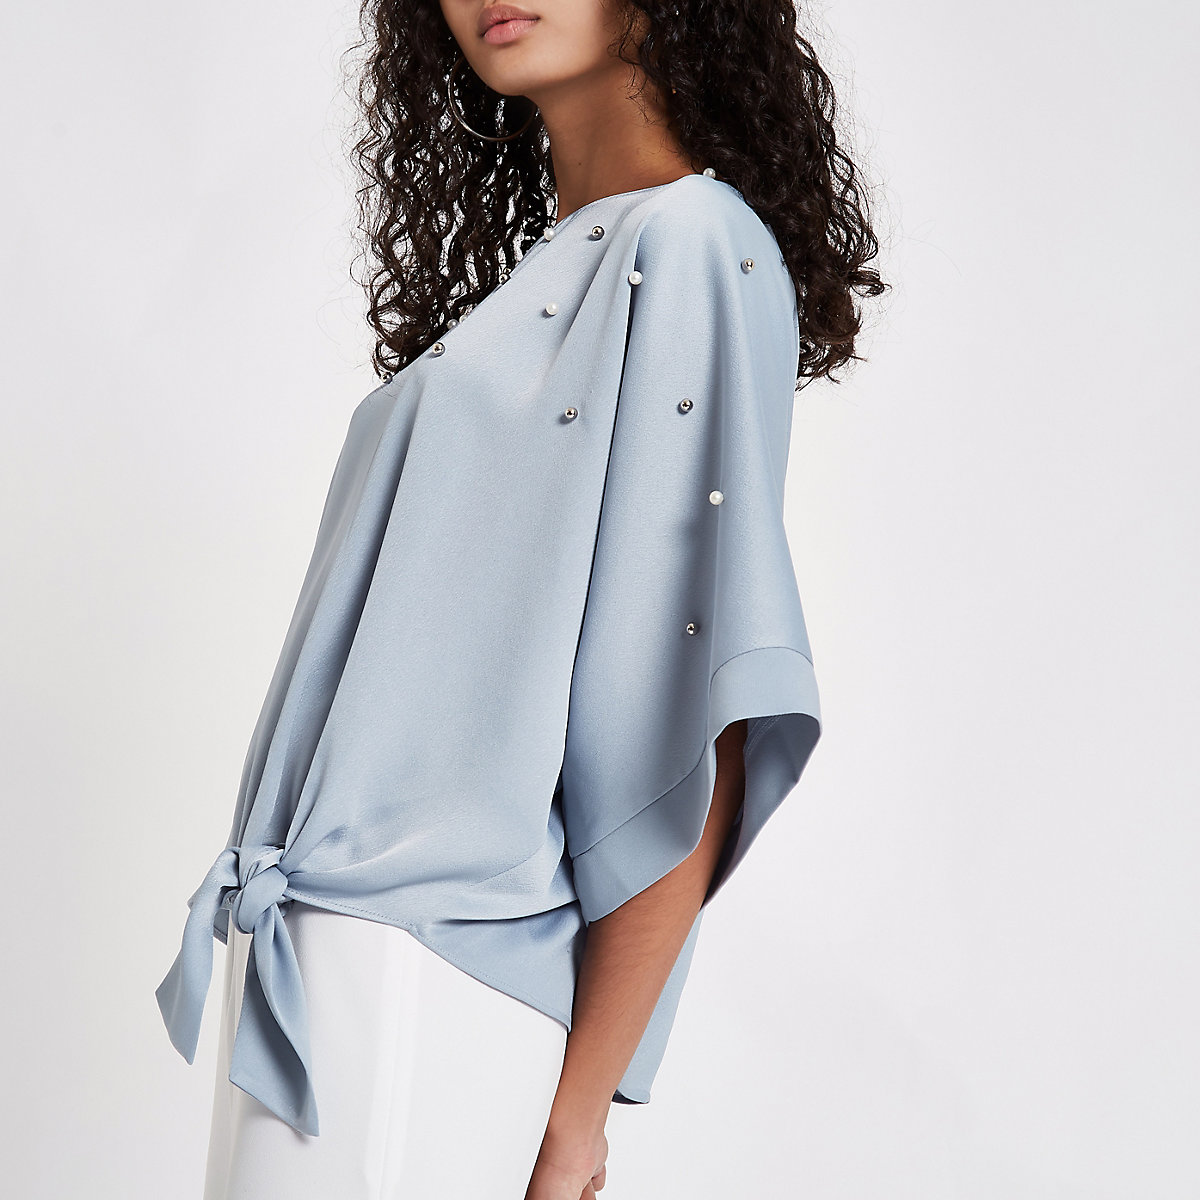 Blue pearl embellished kimono sleeve top